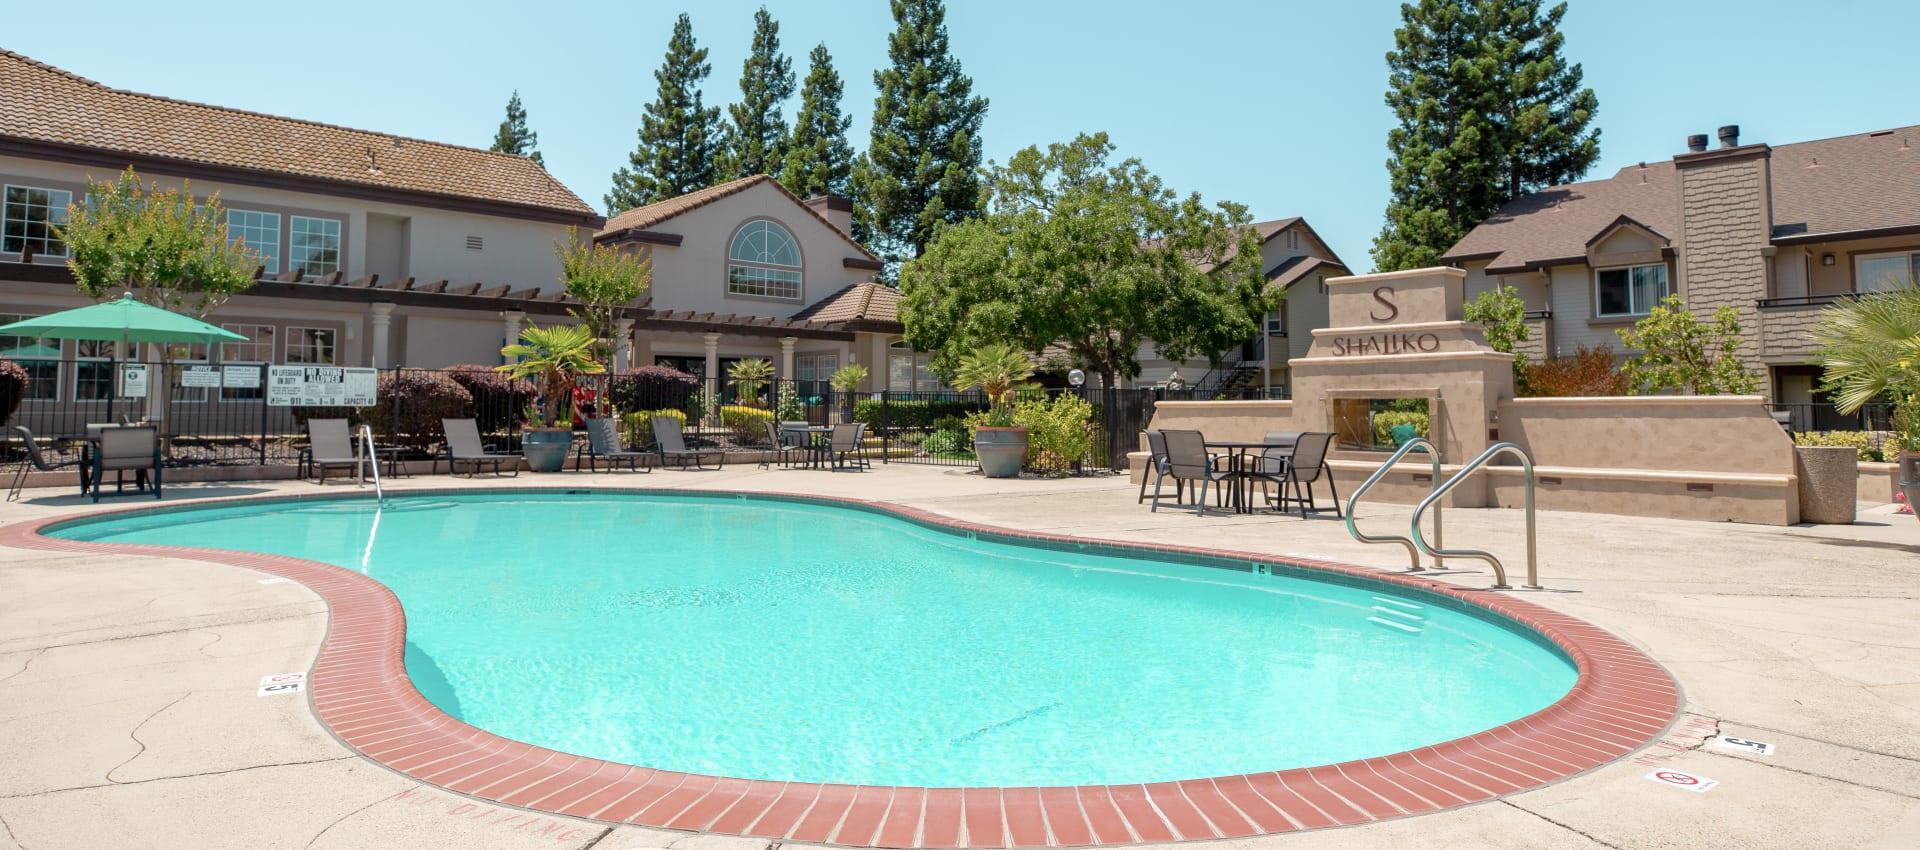 pool area at Shaliko in Rocklin, California.